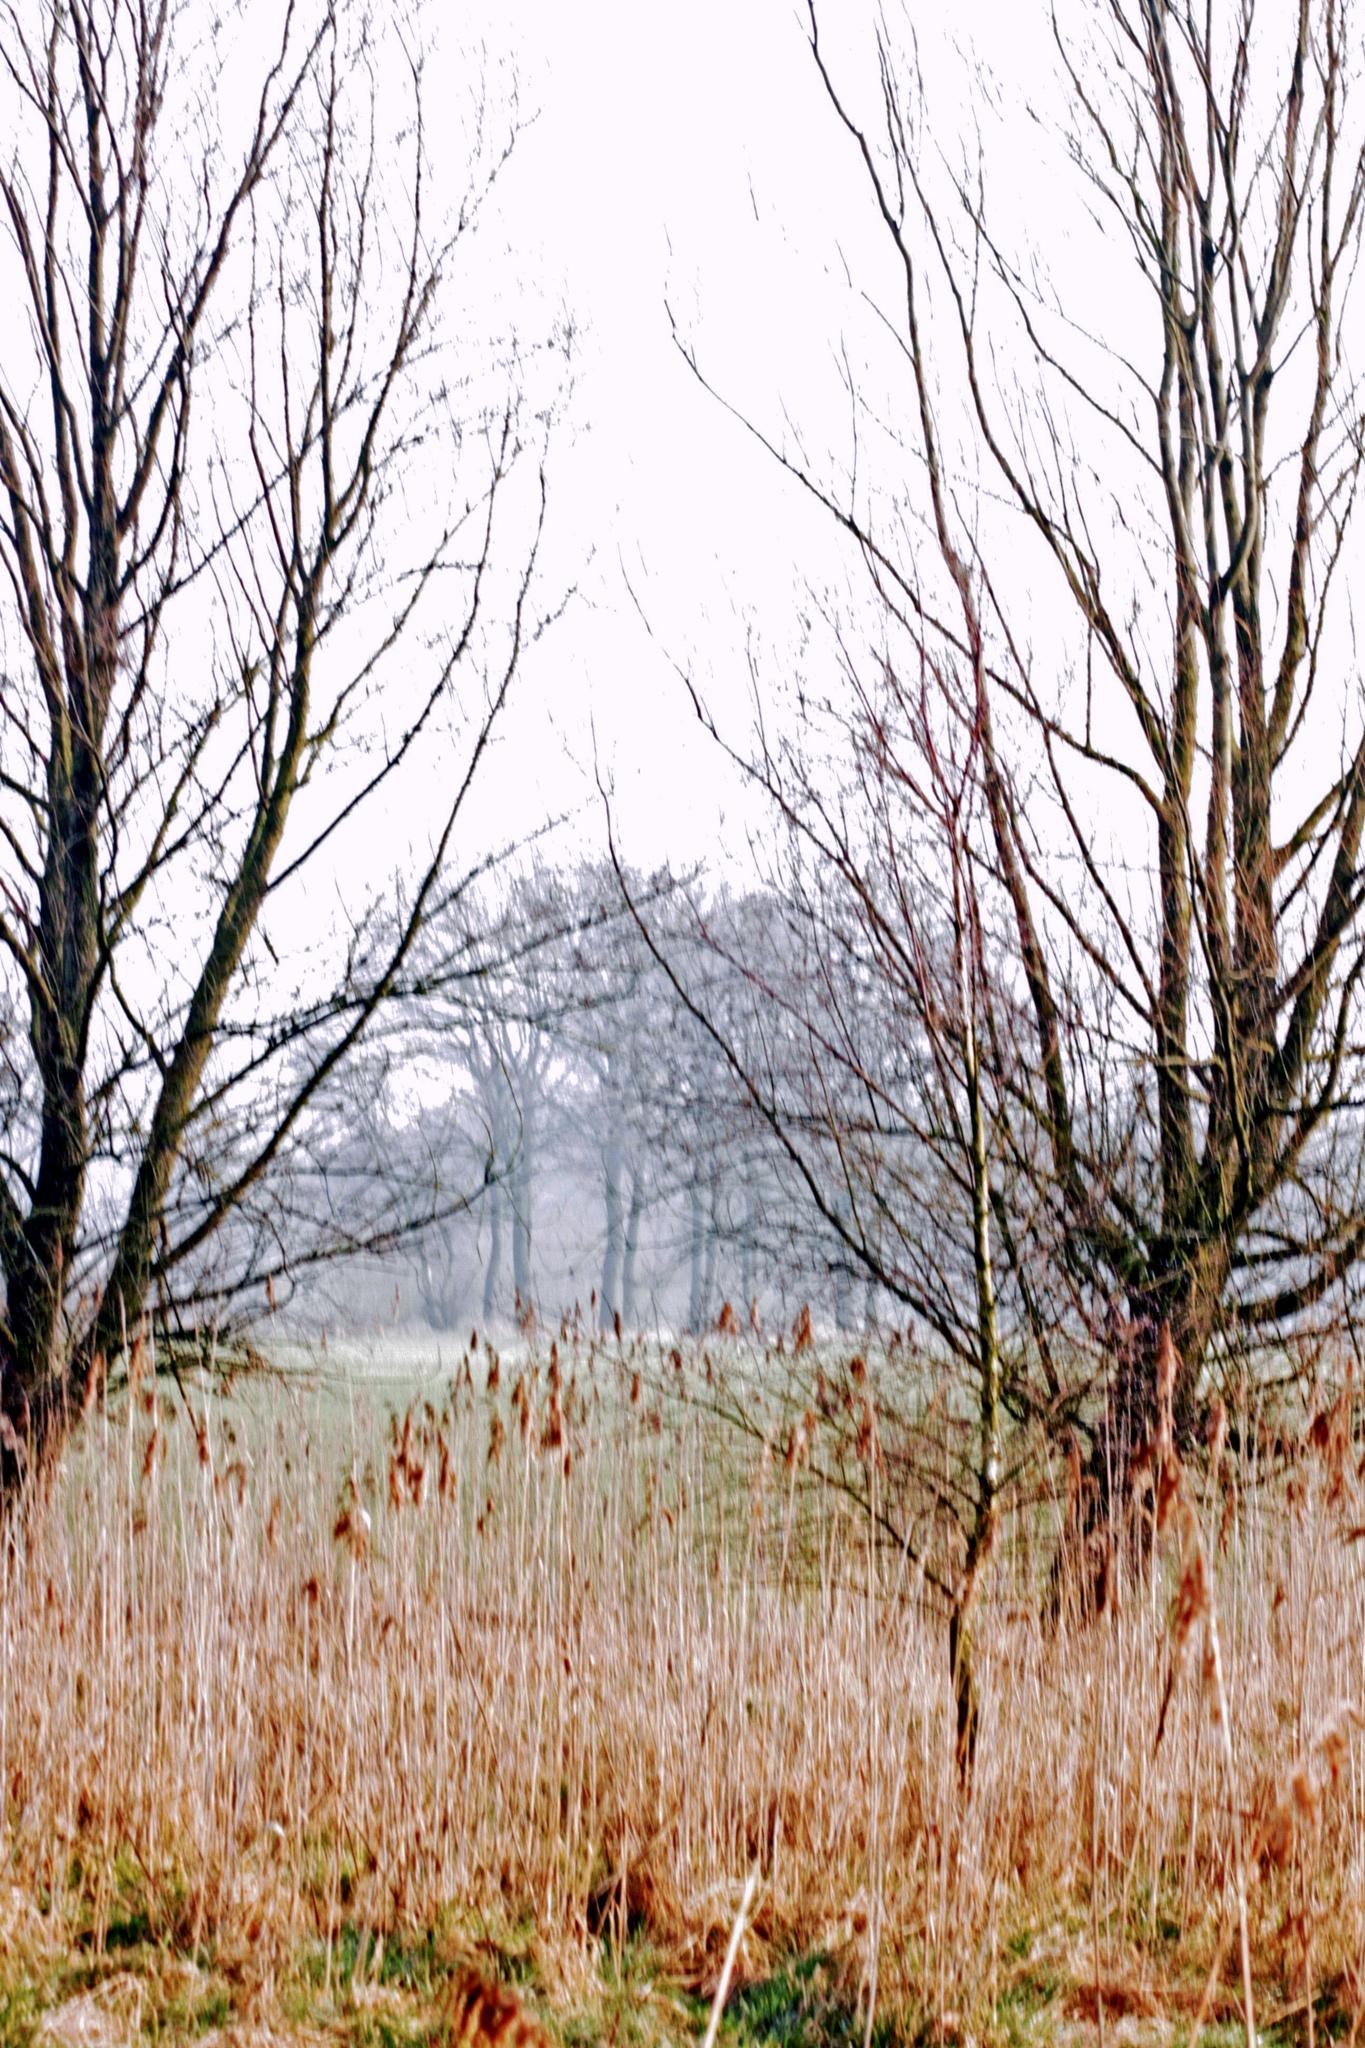 Heathland in the morning. by frankverhoeven1